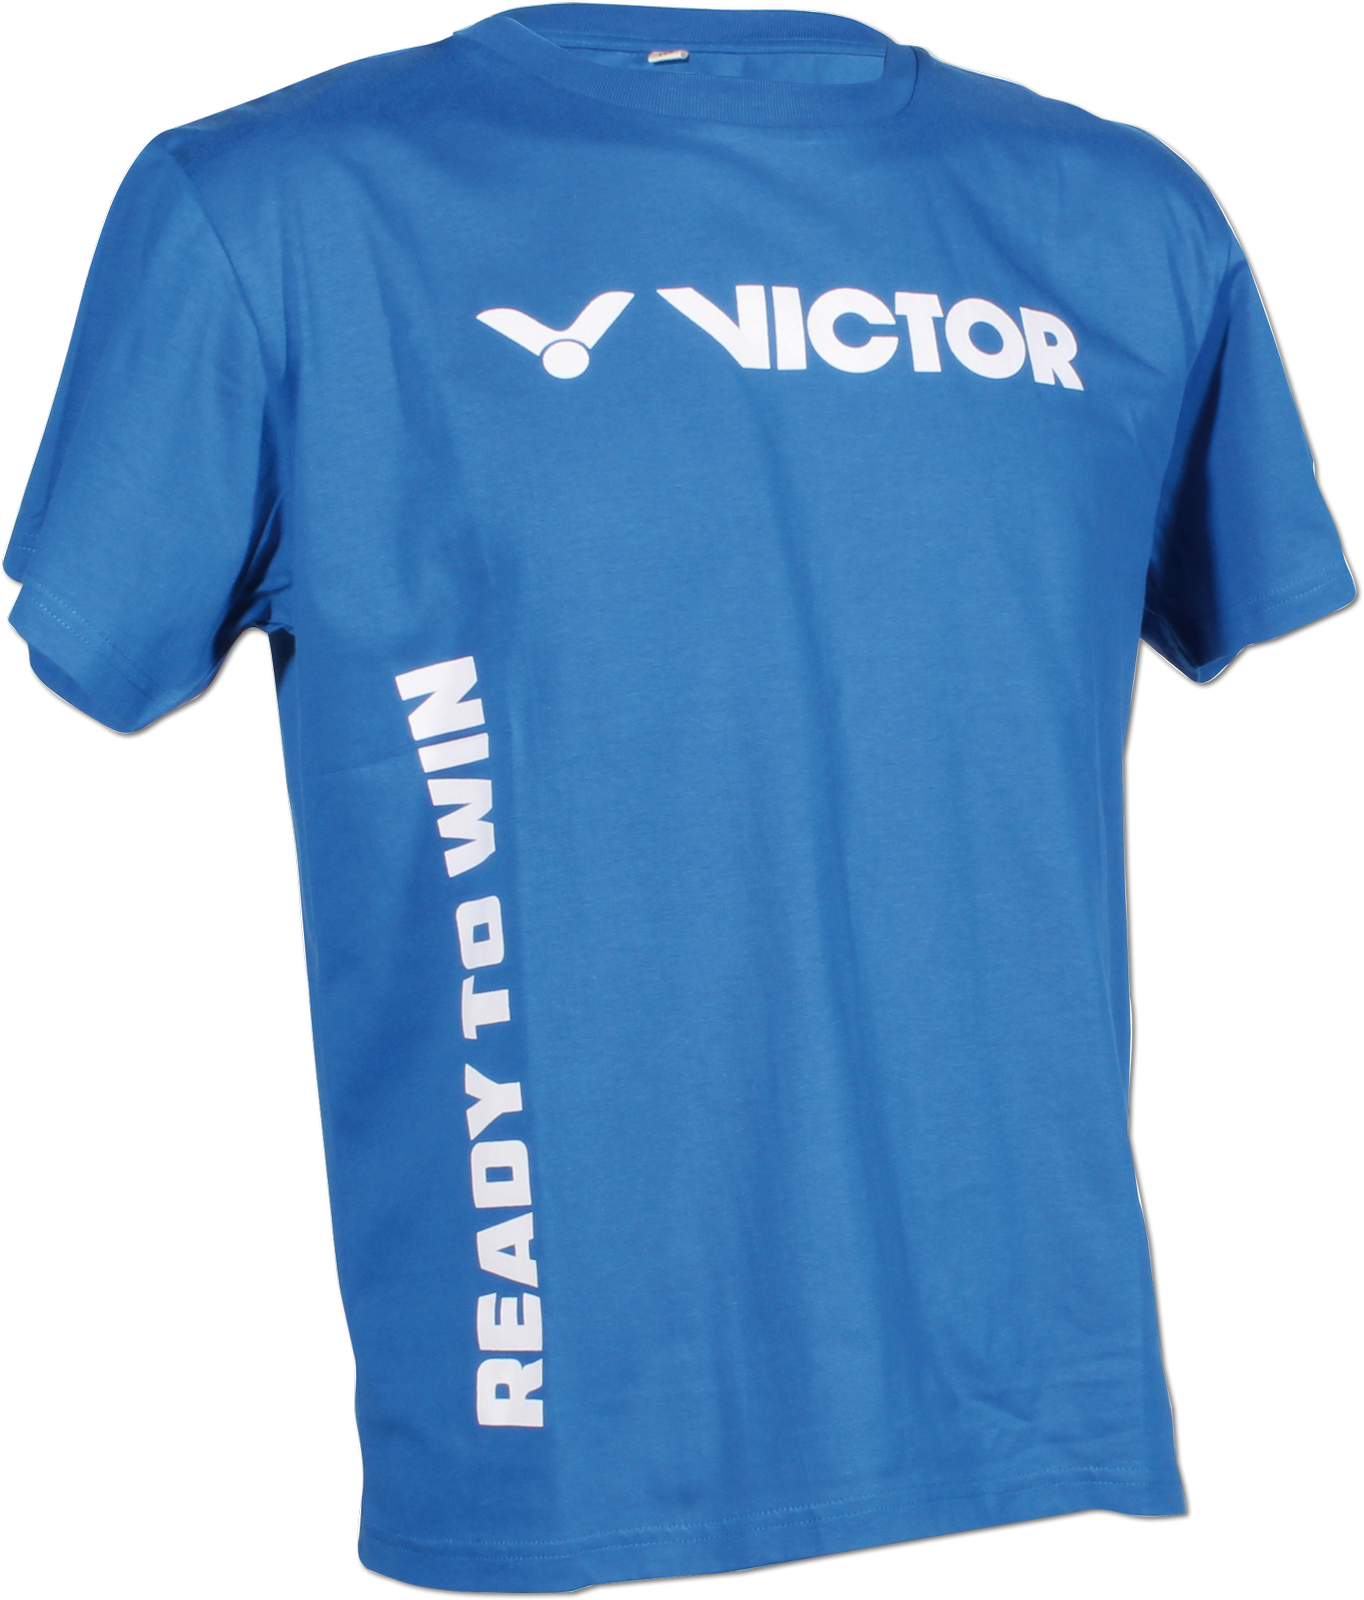 Victor Promoshirt organic - Ready to win